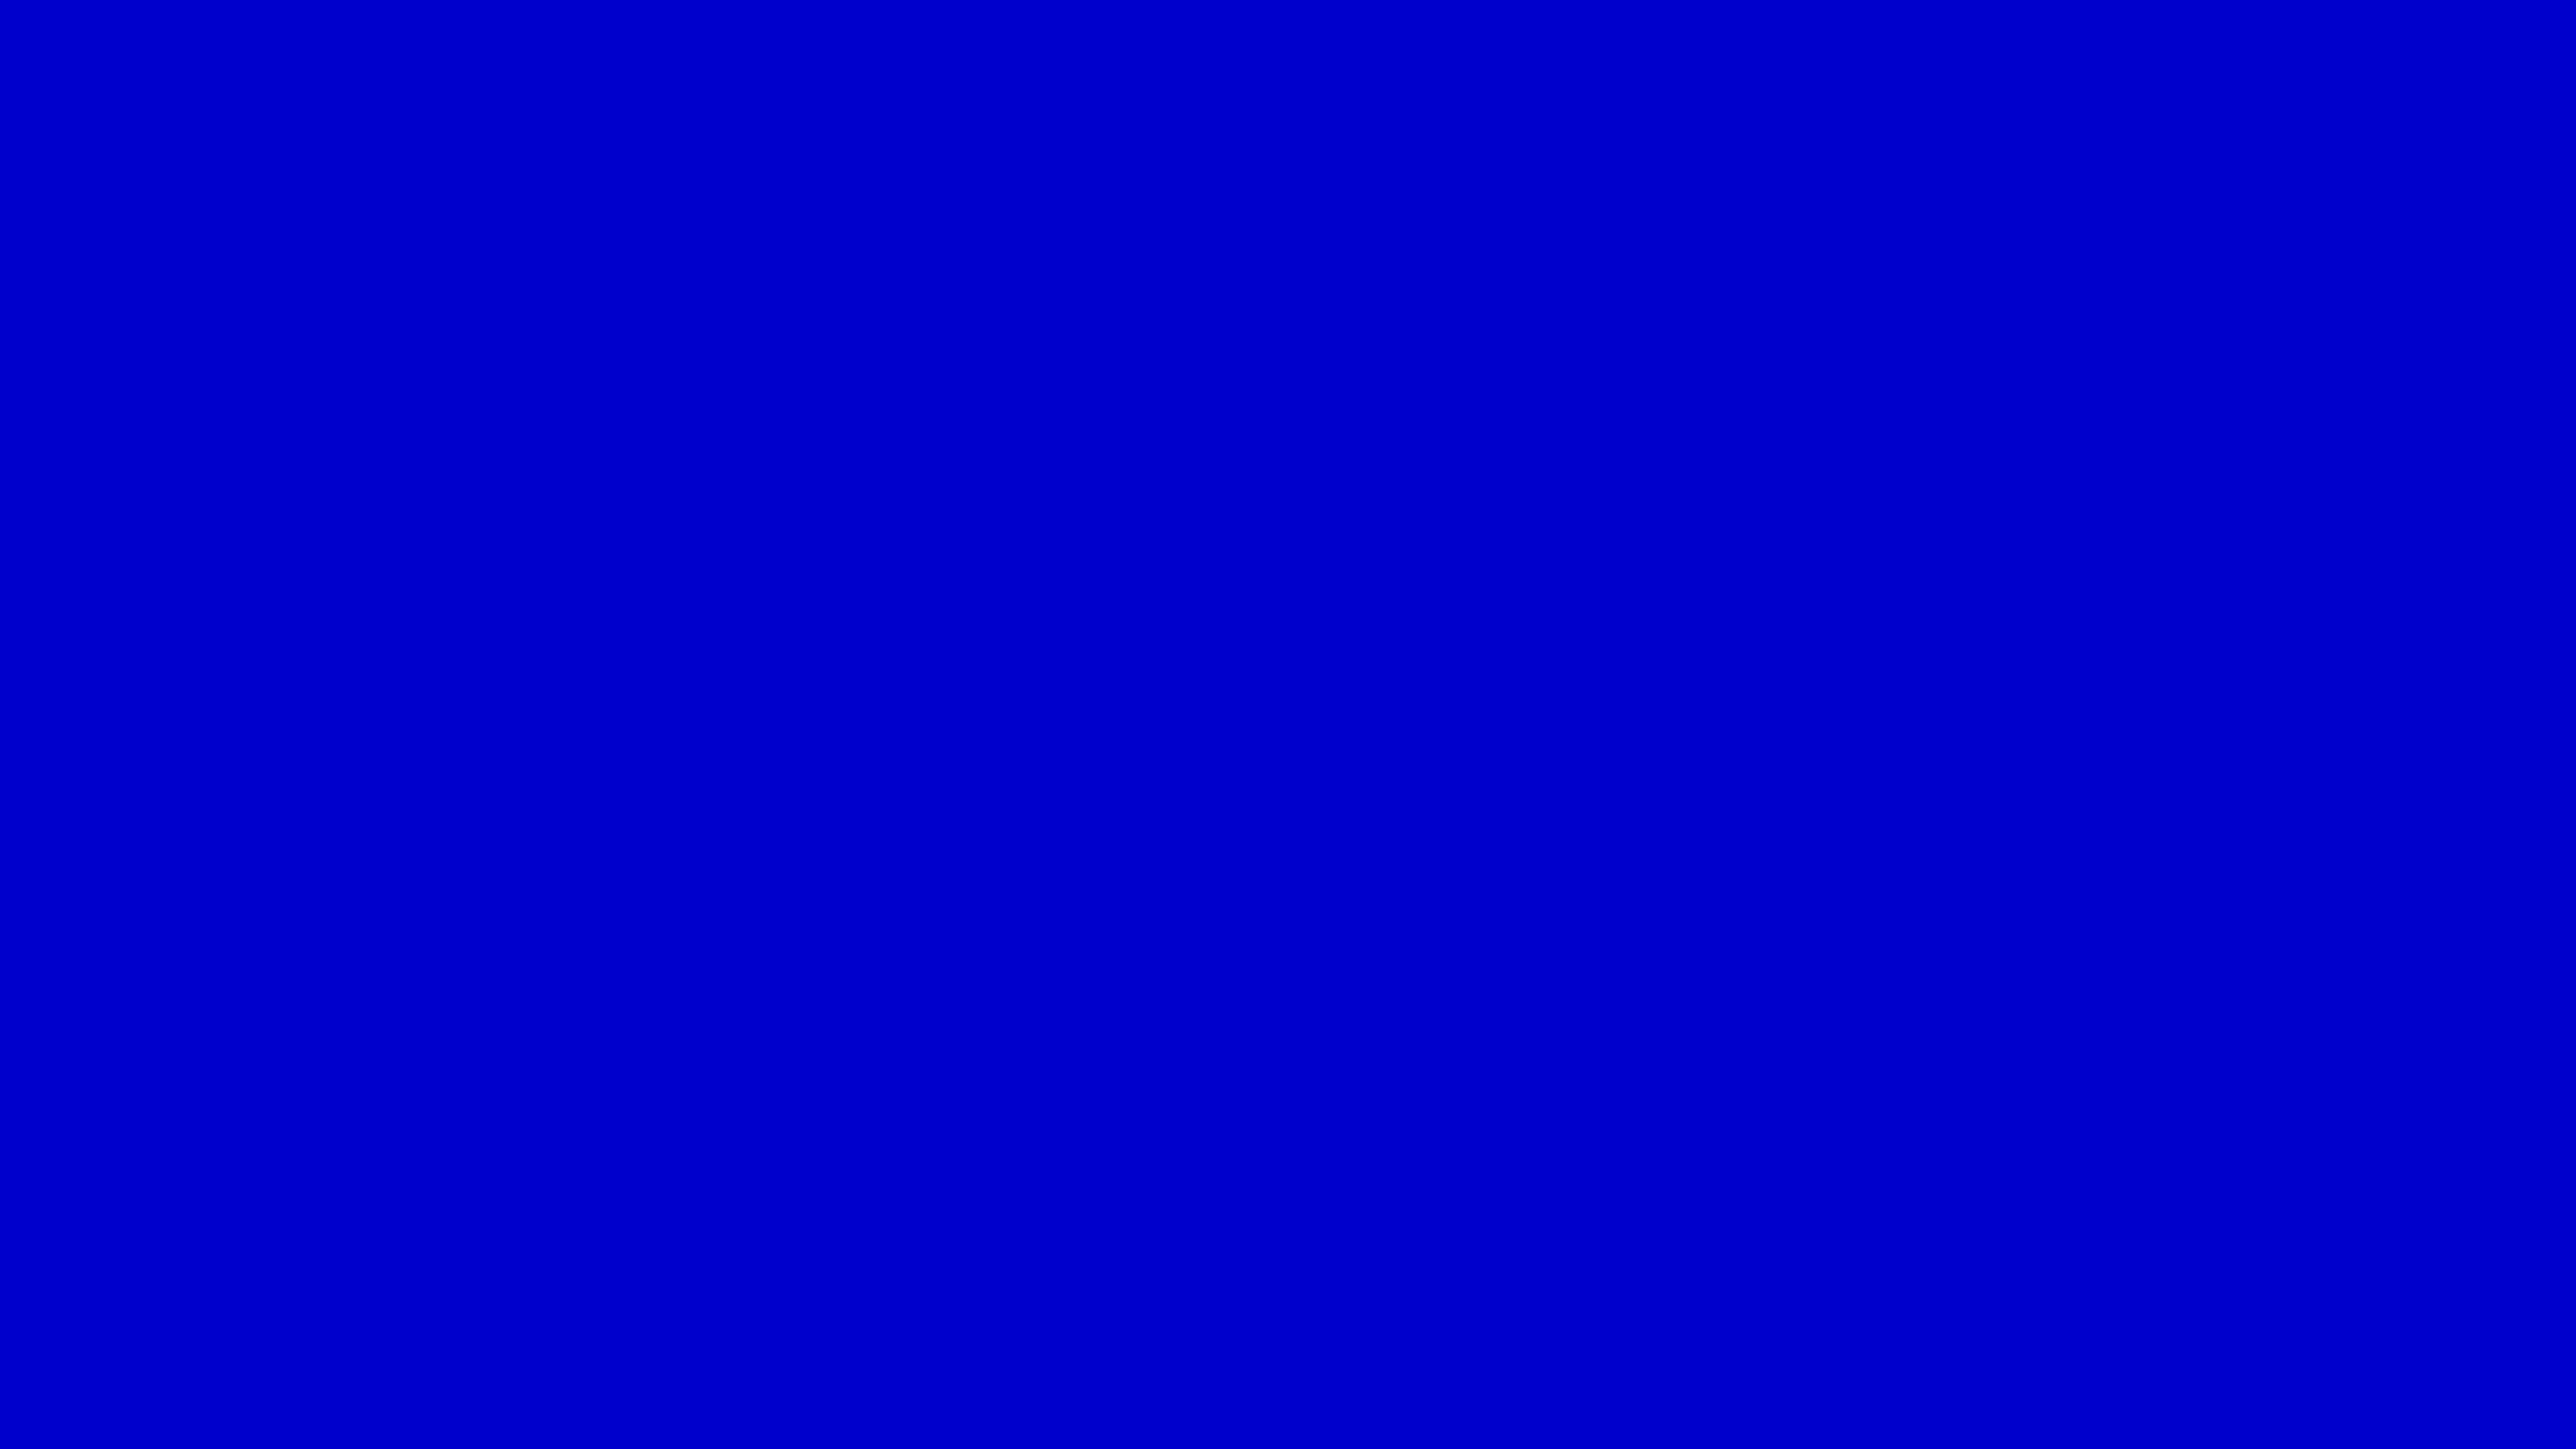 5120x2880 Medium Blue Solid Color Background